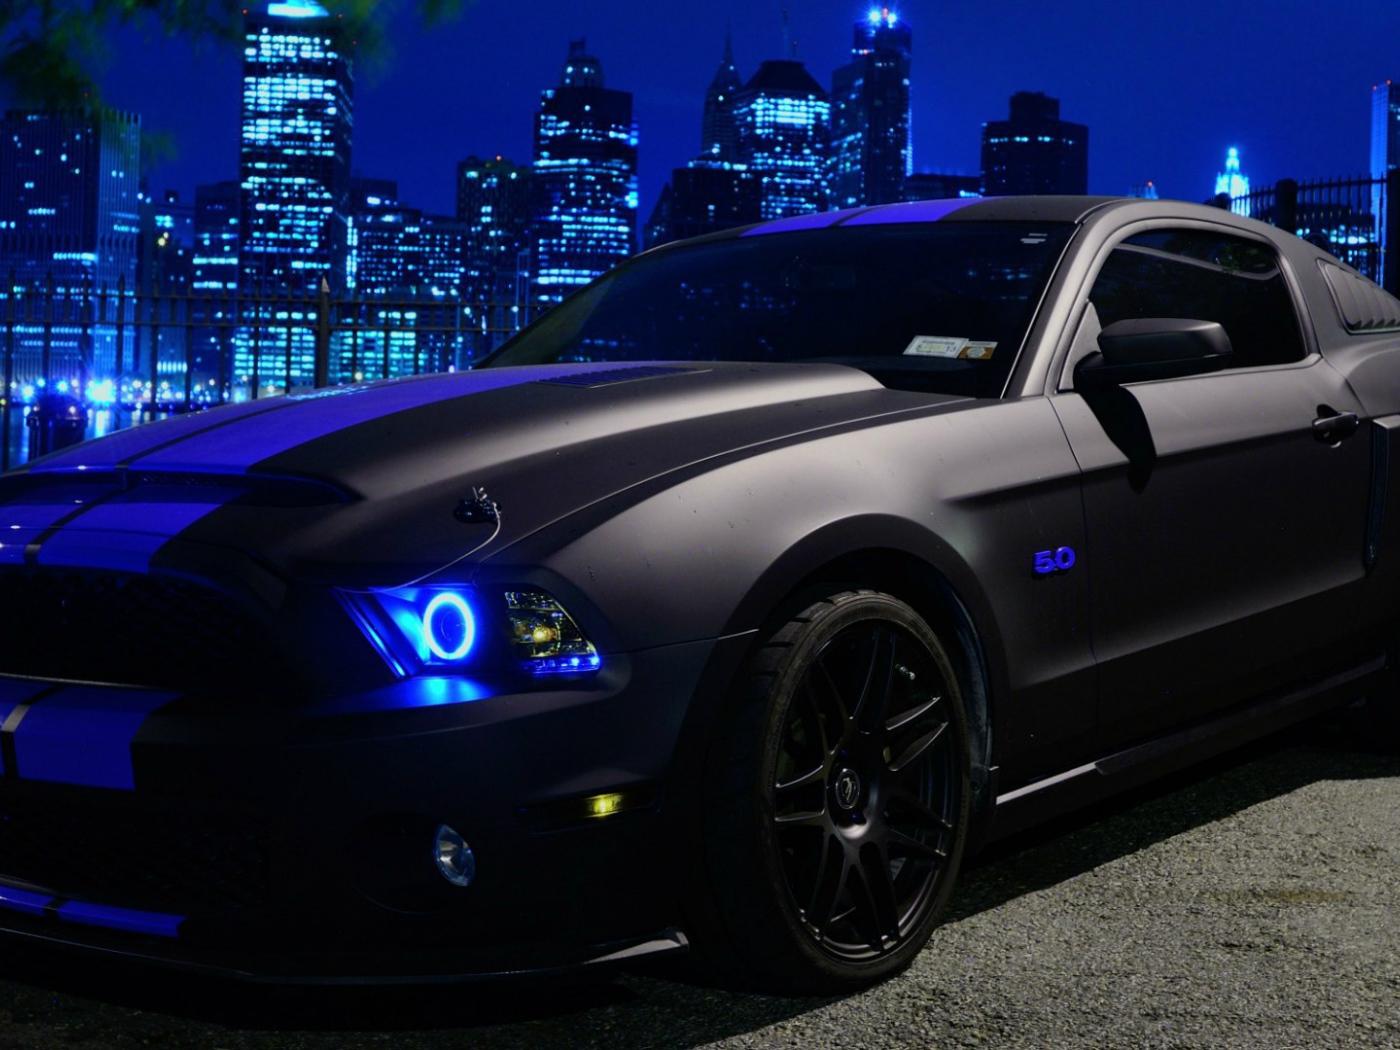 Black Neon Ford Mustang Desktop Wallpapers 1400x1050